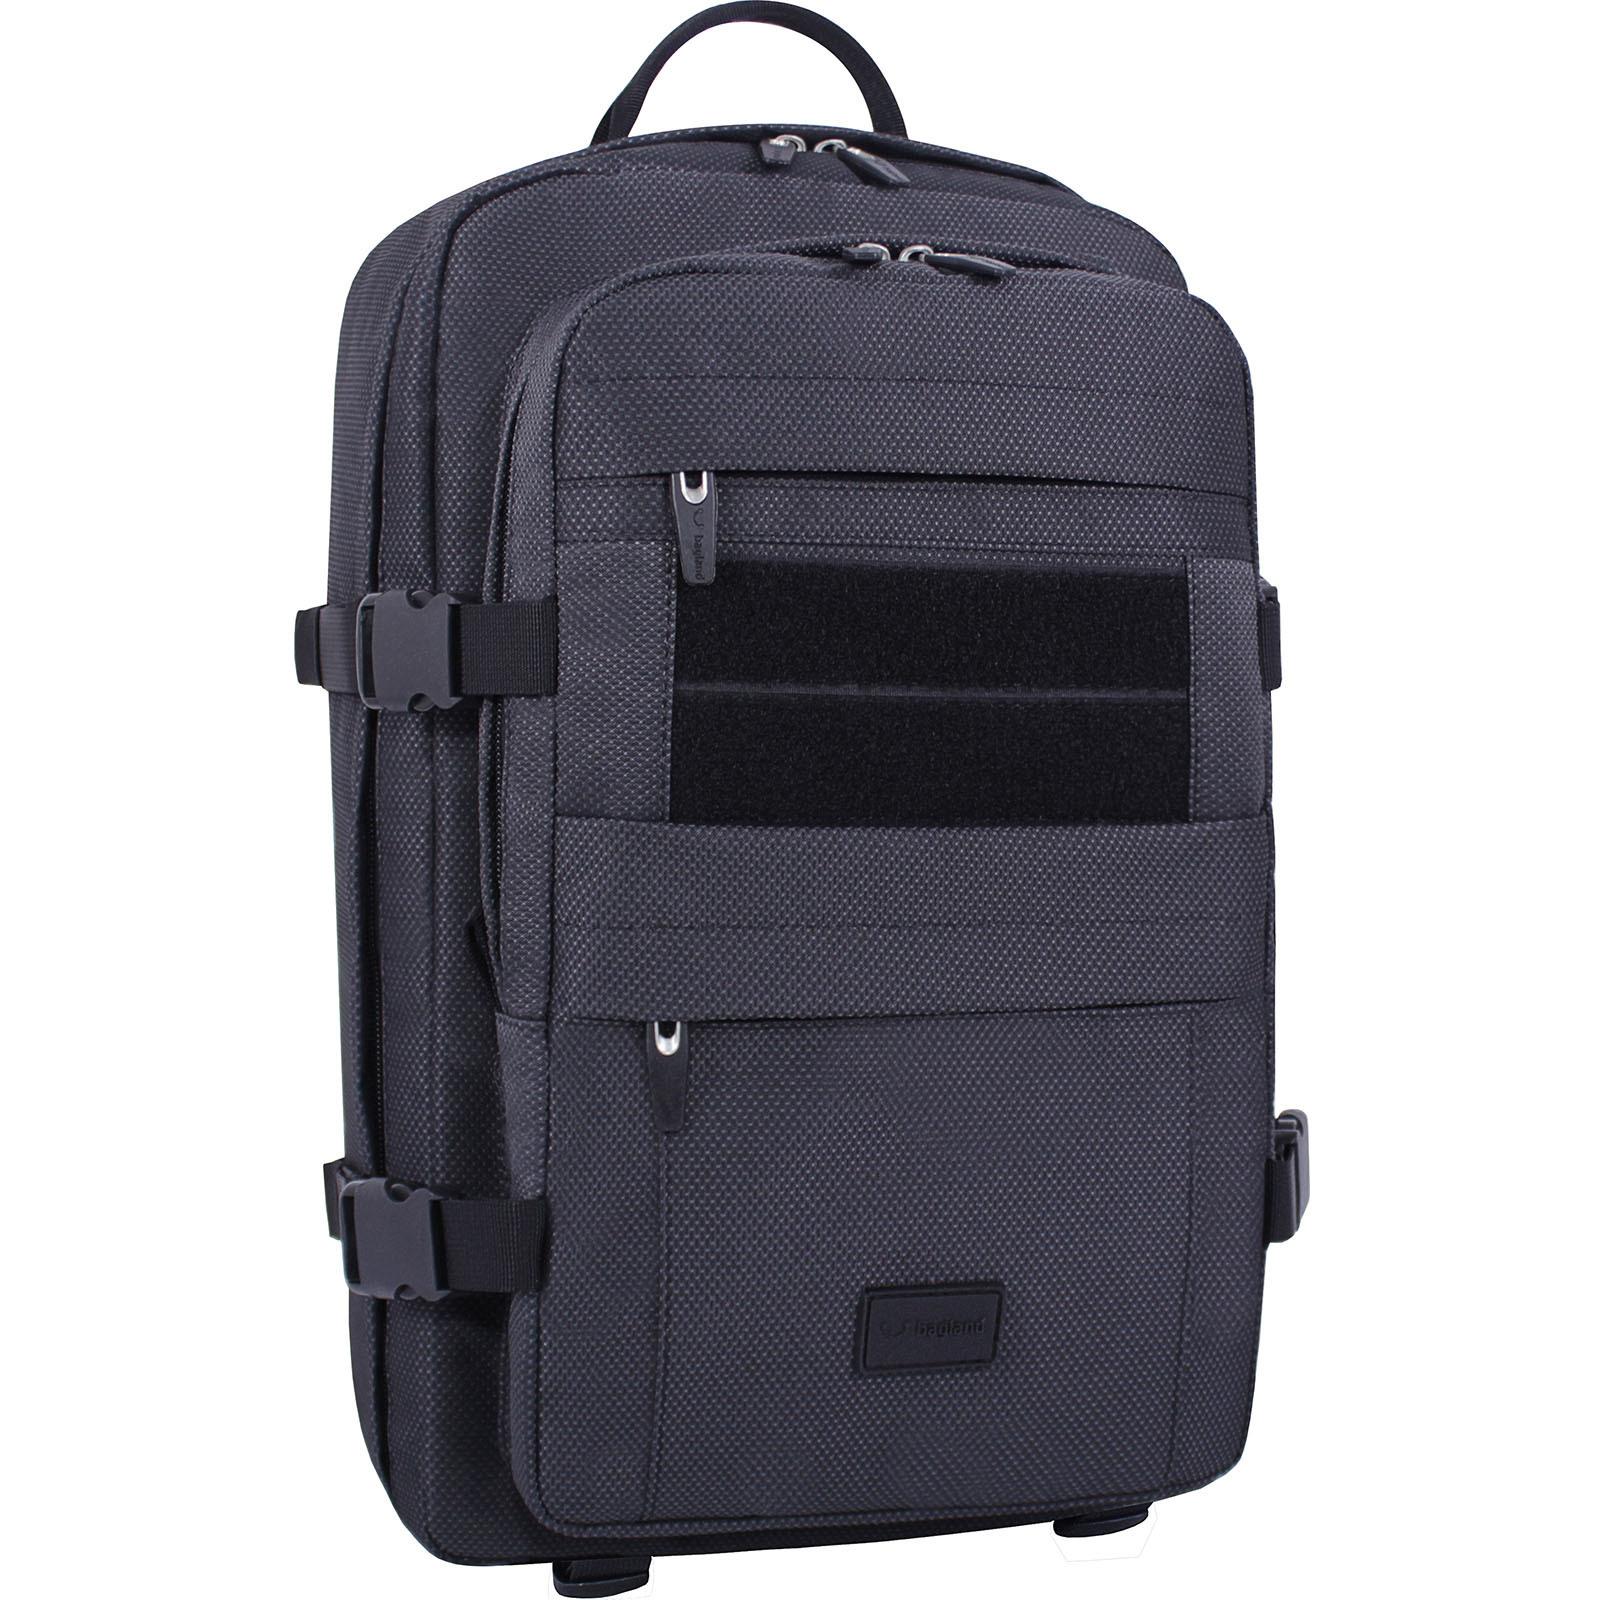 Мужские рюкзаки Рюкзак для ноутбука Bagland Jasper 19 л. Чёрный (00155169) IMG_3183.JPG